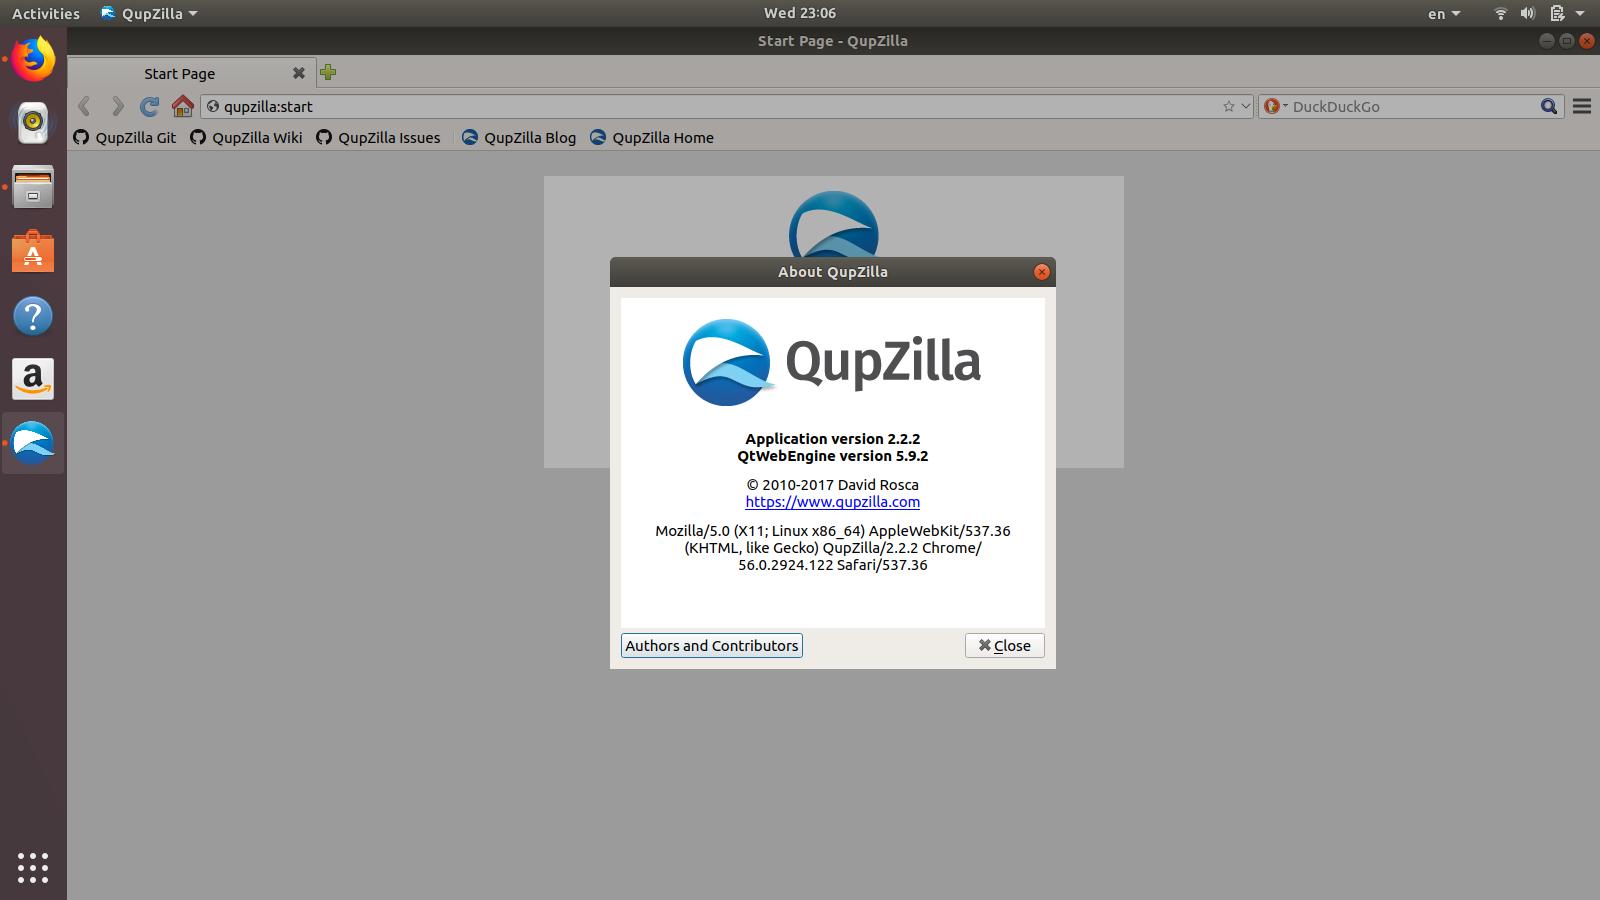 How to install program on Ubuntu: How to install QupZilla